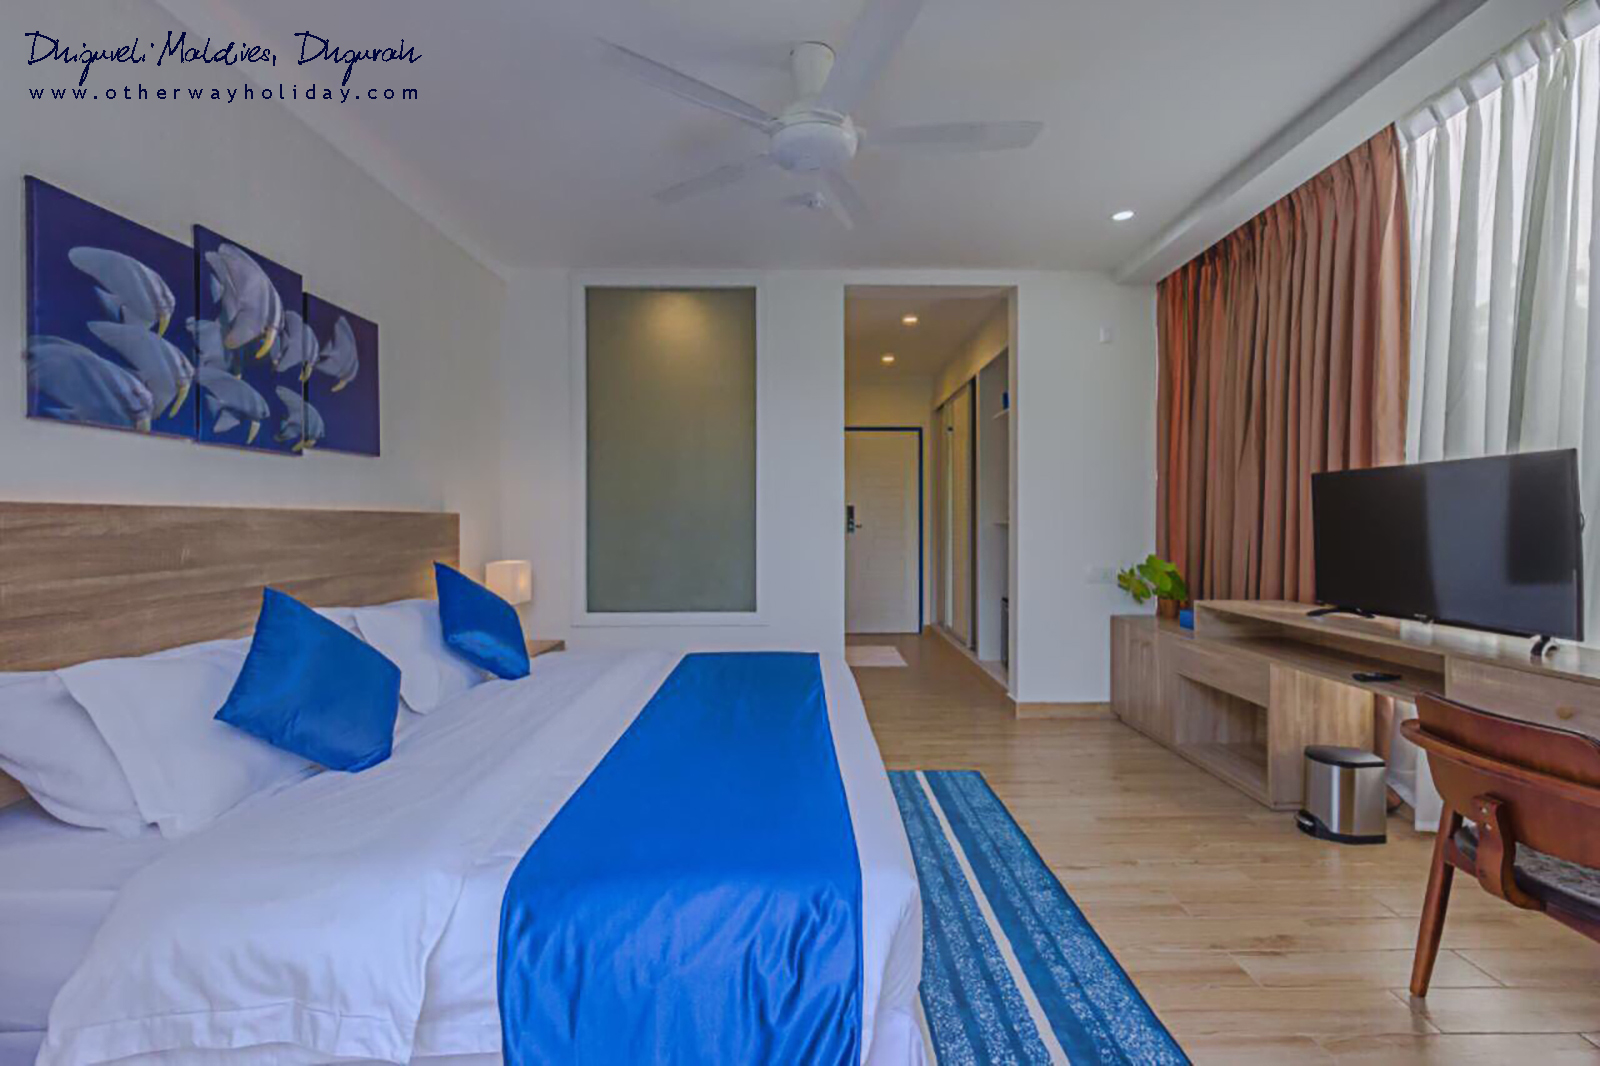 Dhiguveli Maldives, Dhigurah 13